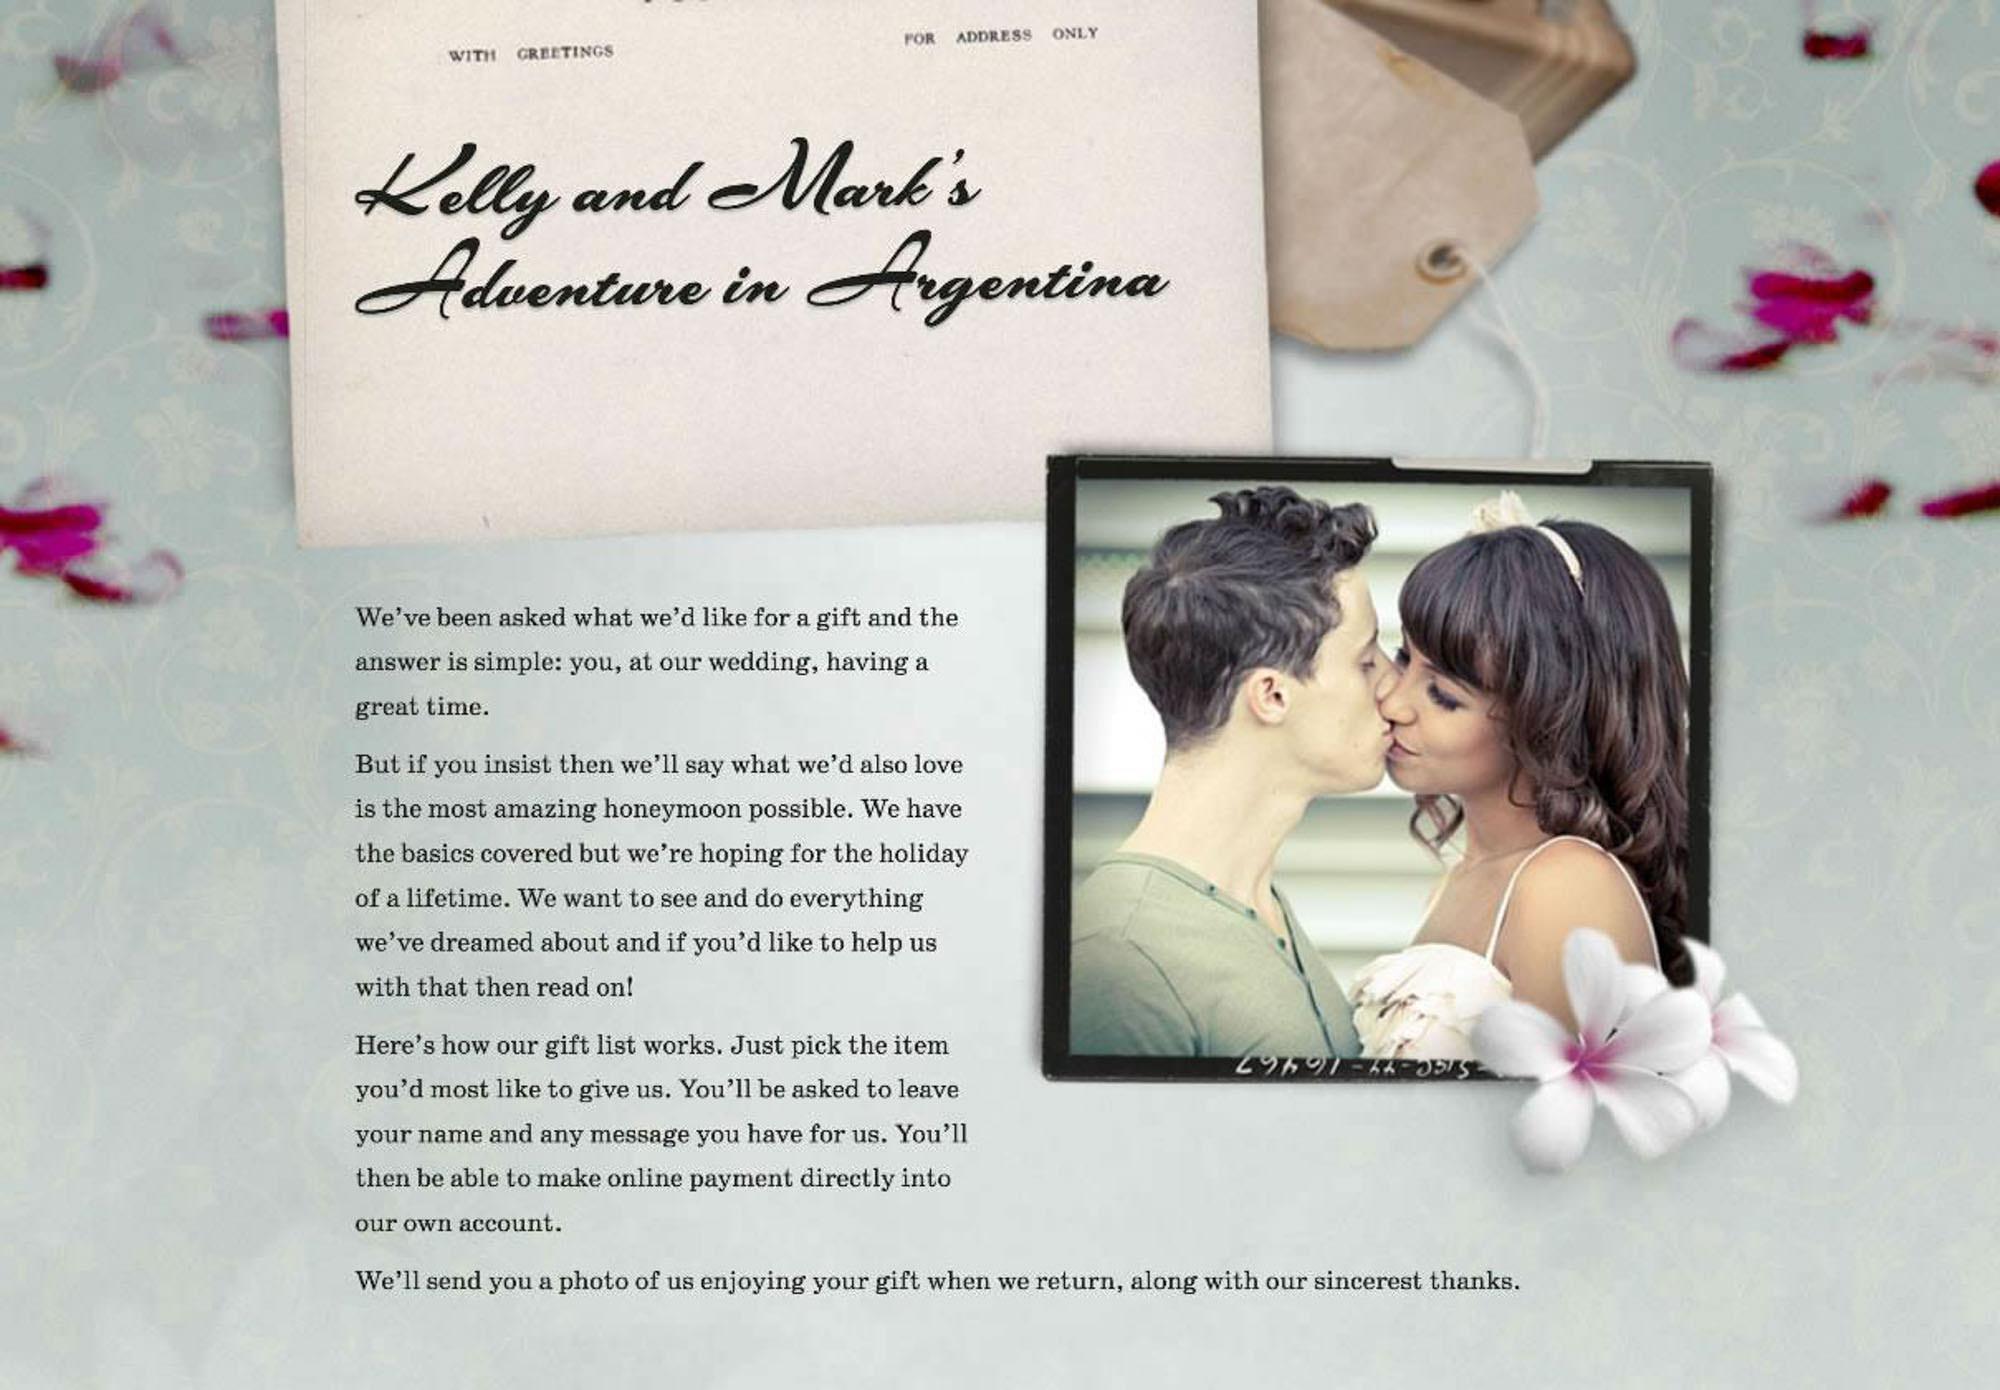 Buy Our Honeymoon - Alternative wedding gift service